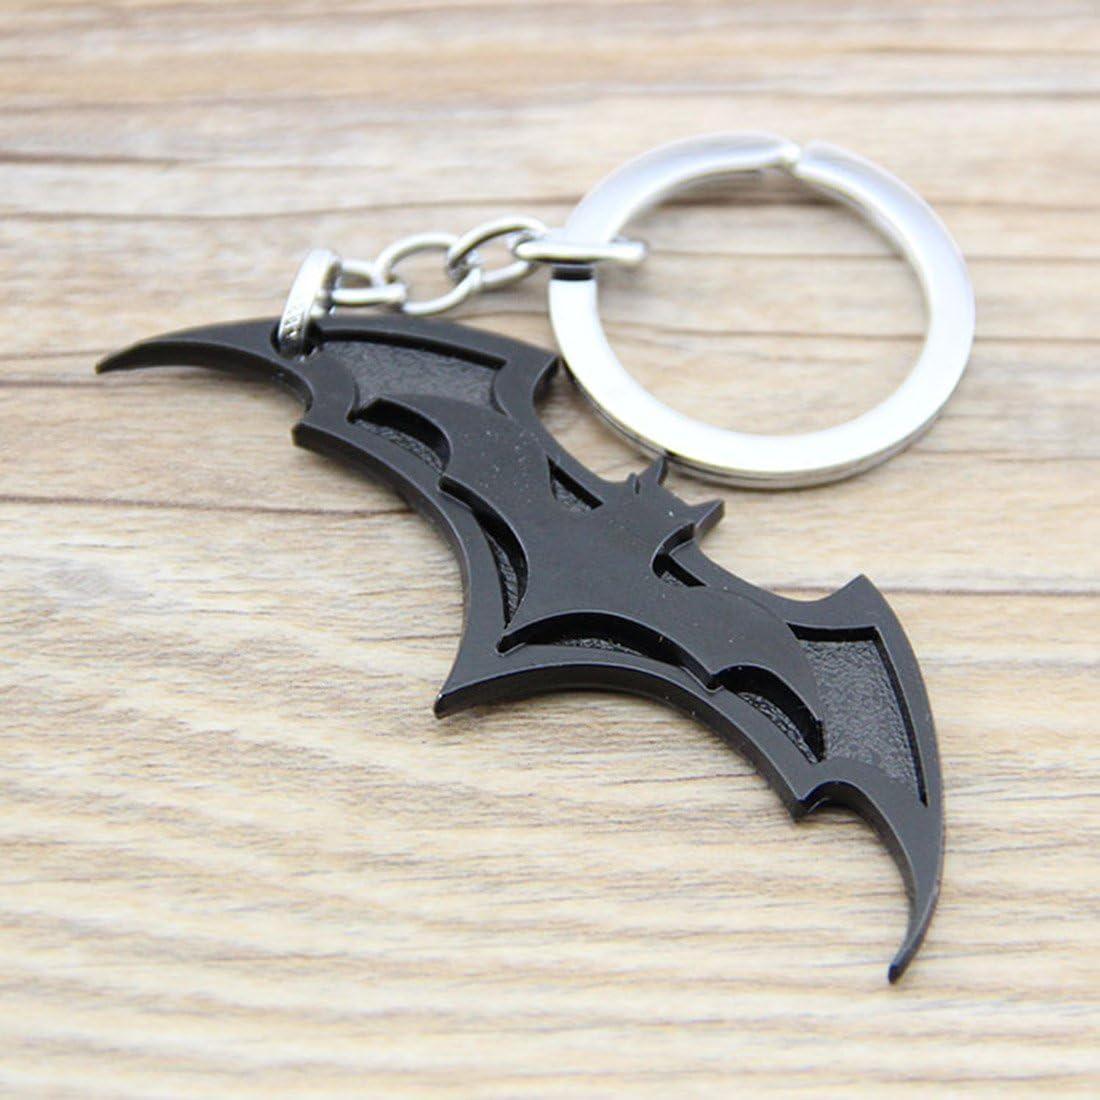 Cool Bat Symbol Key Chain Zinc Alloy Keychain Bat Shape Metal Key Ring Tag for Your Autos, Home or Boat (Black)